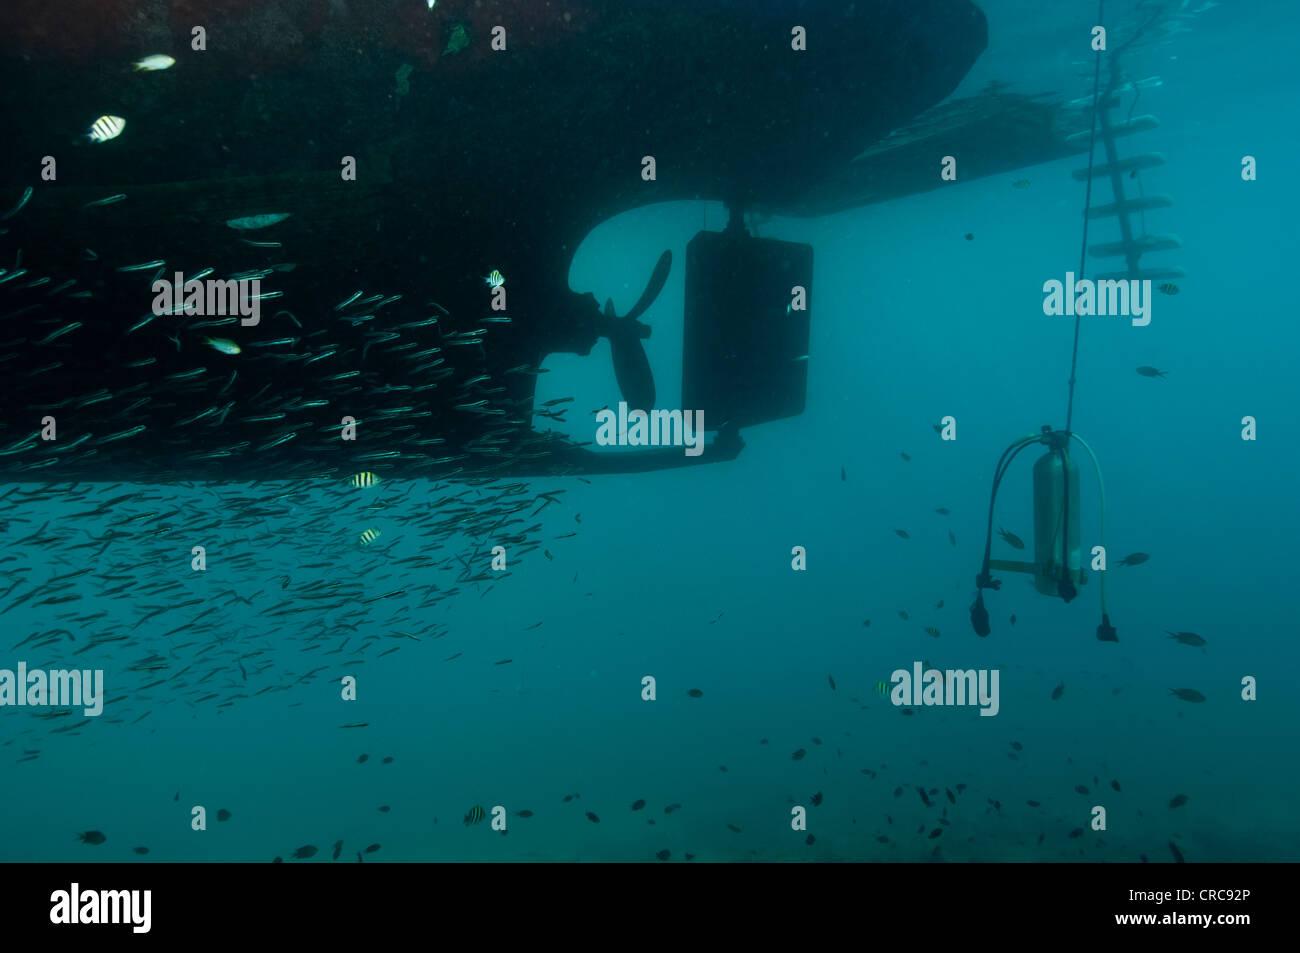 underwater shot of dive boat propeller with scuba tank hanging below - Stock Image